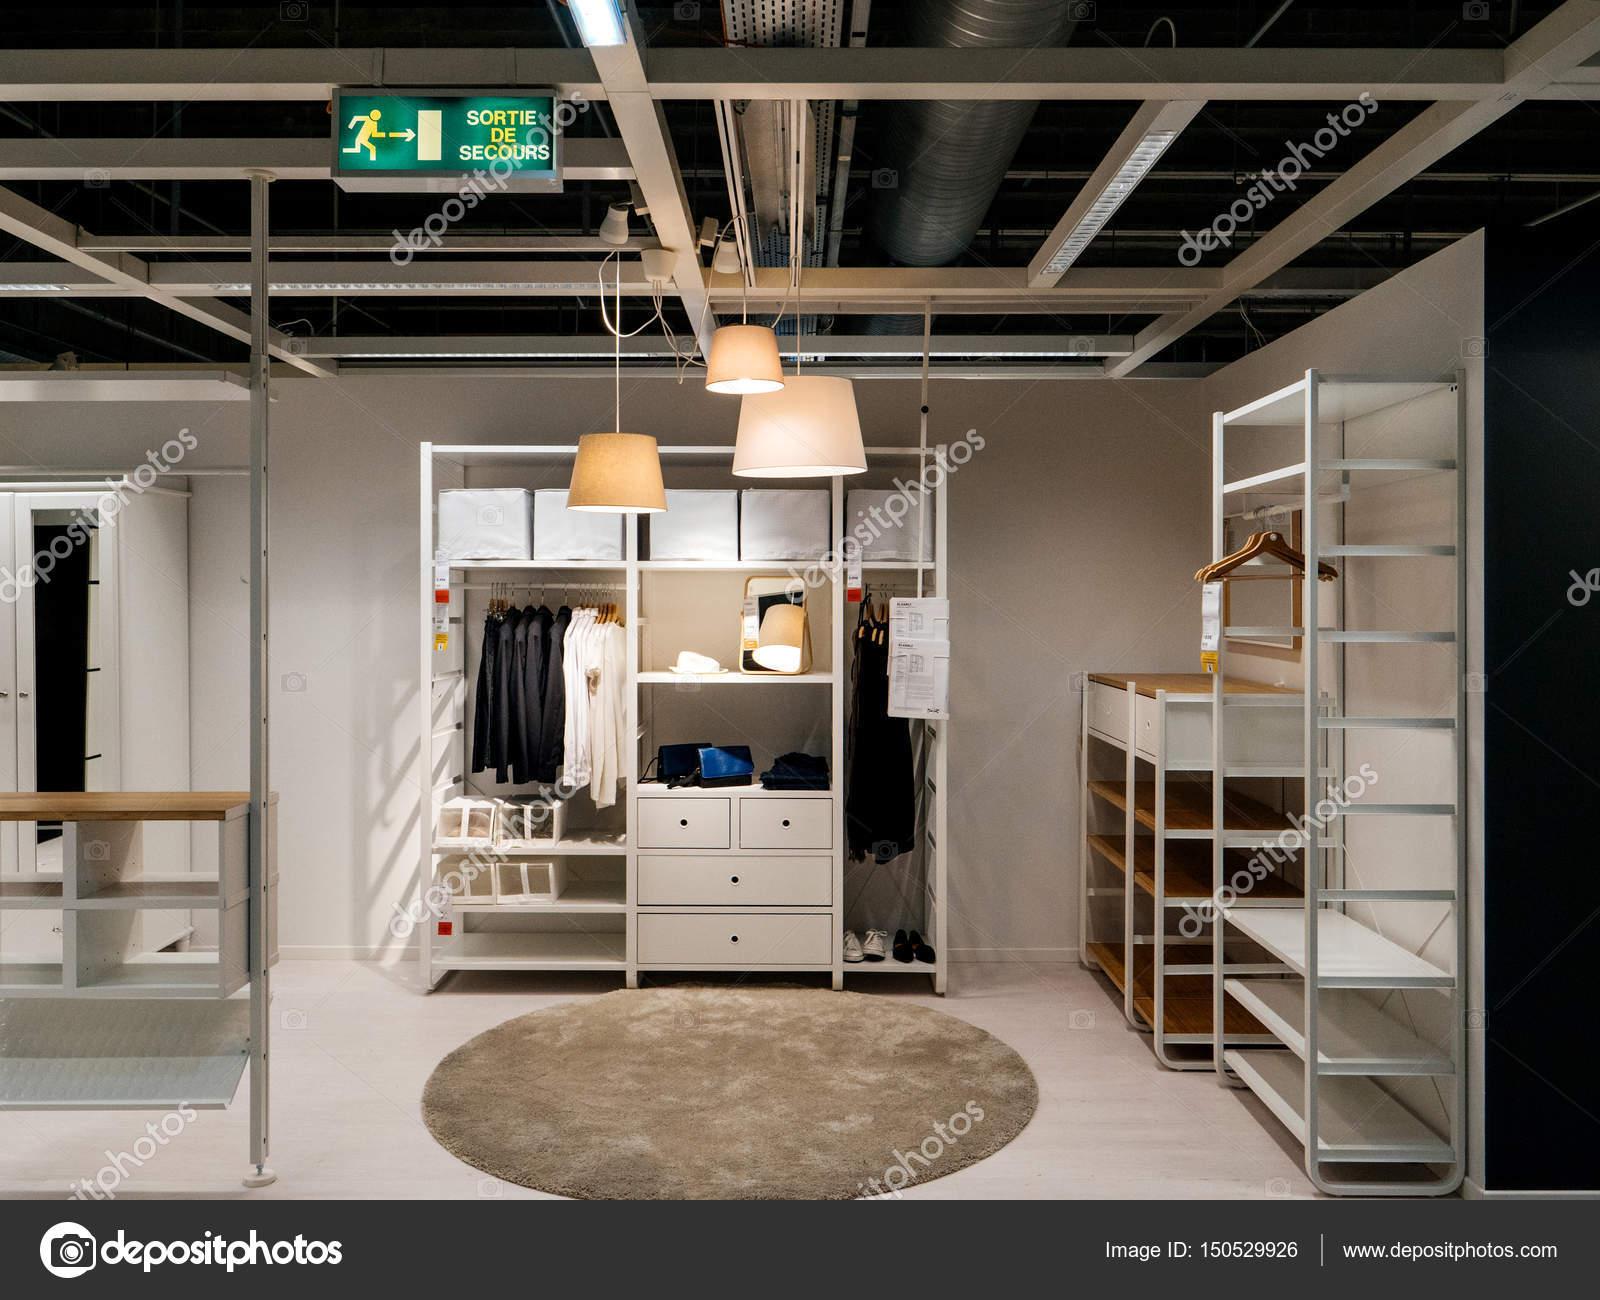 Ikea Ufficio Acquisti : Armadi ufficio ikea notevole ikea ufficio acquisti armadio moderno